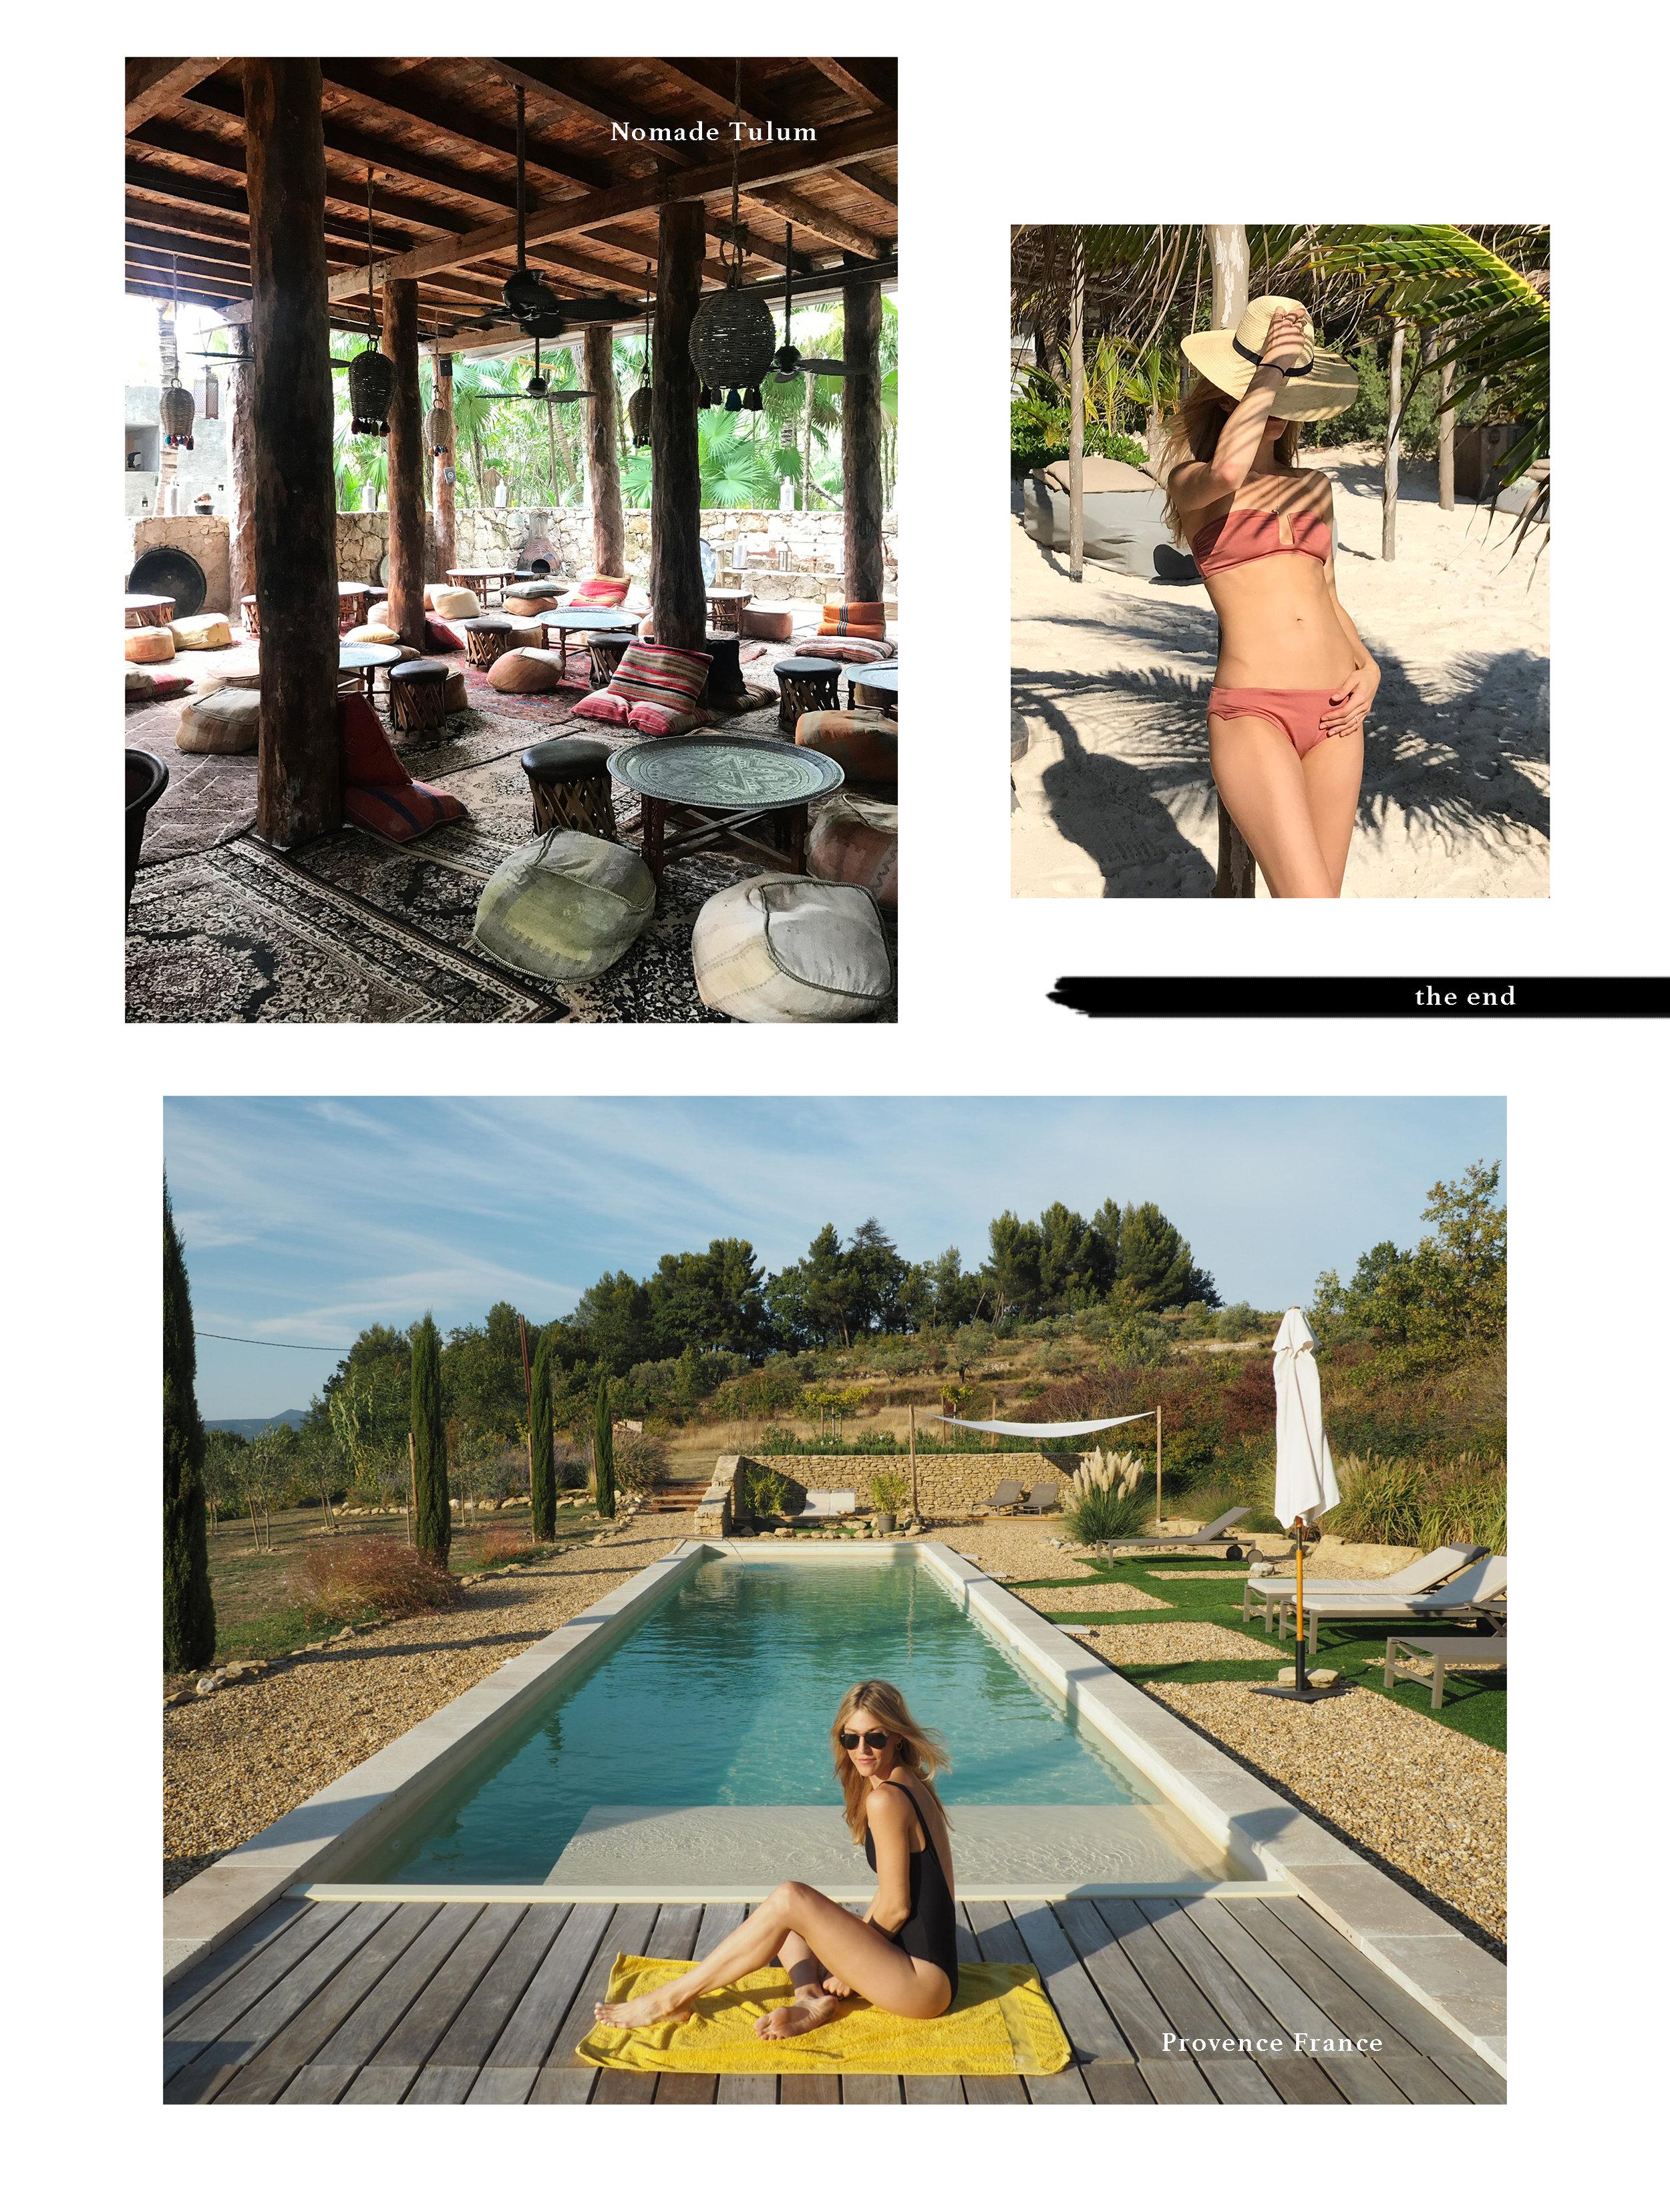 mikc resort page 4.JPG